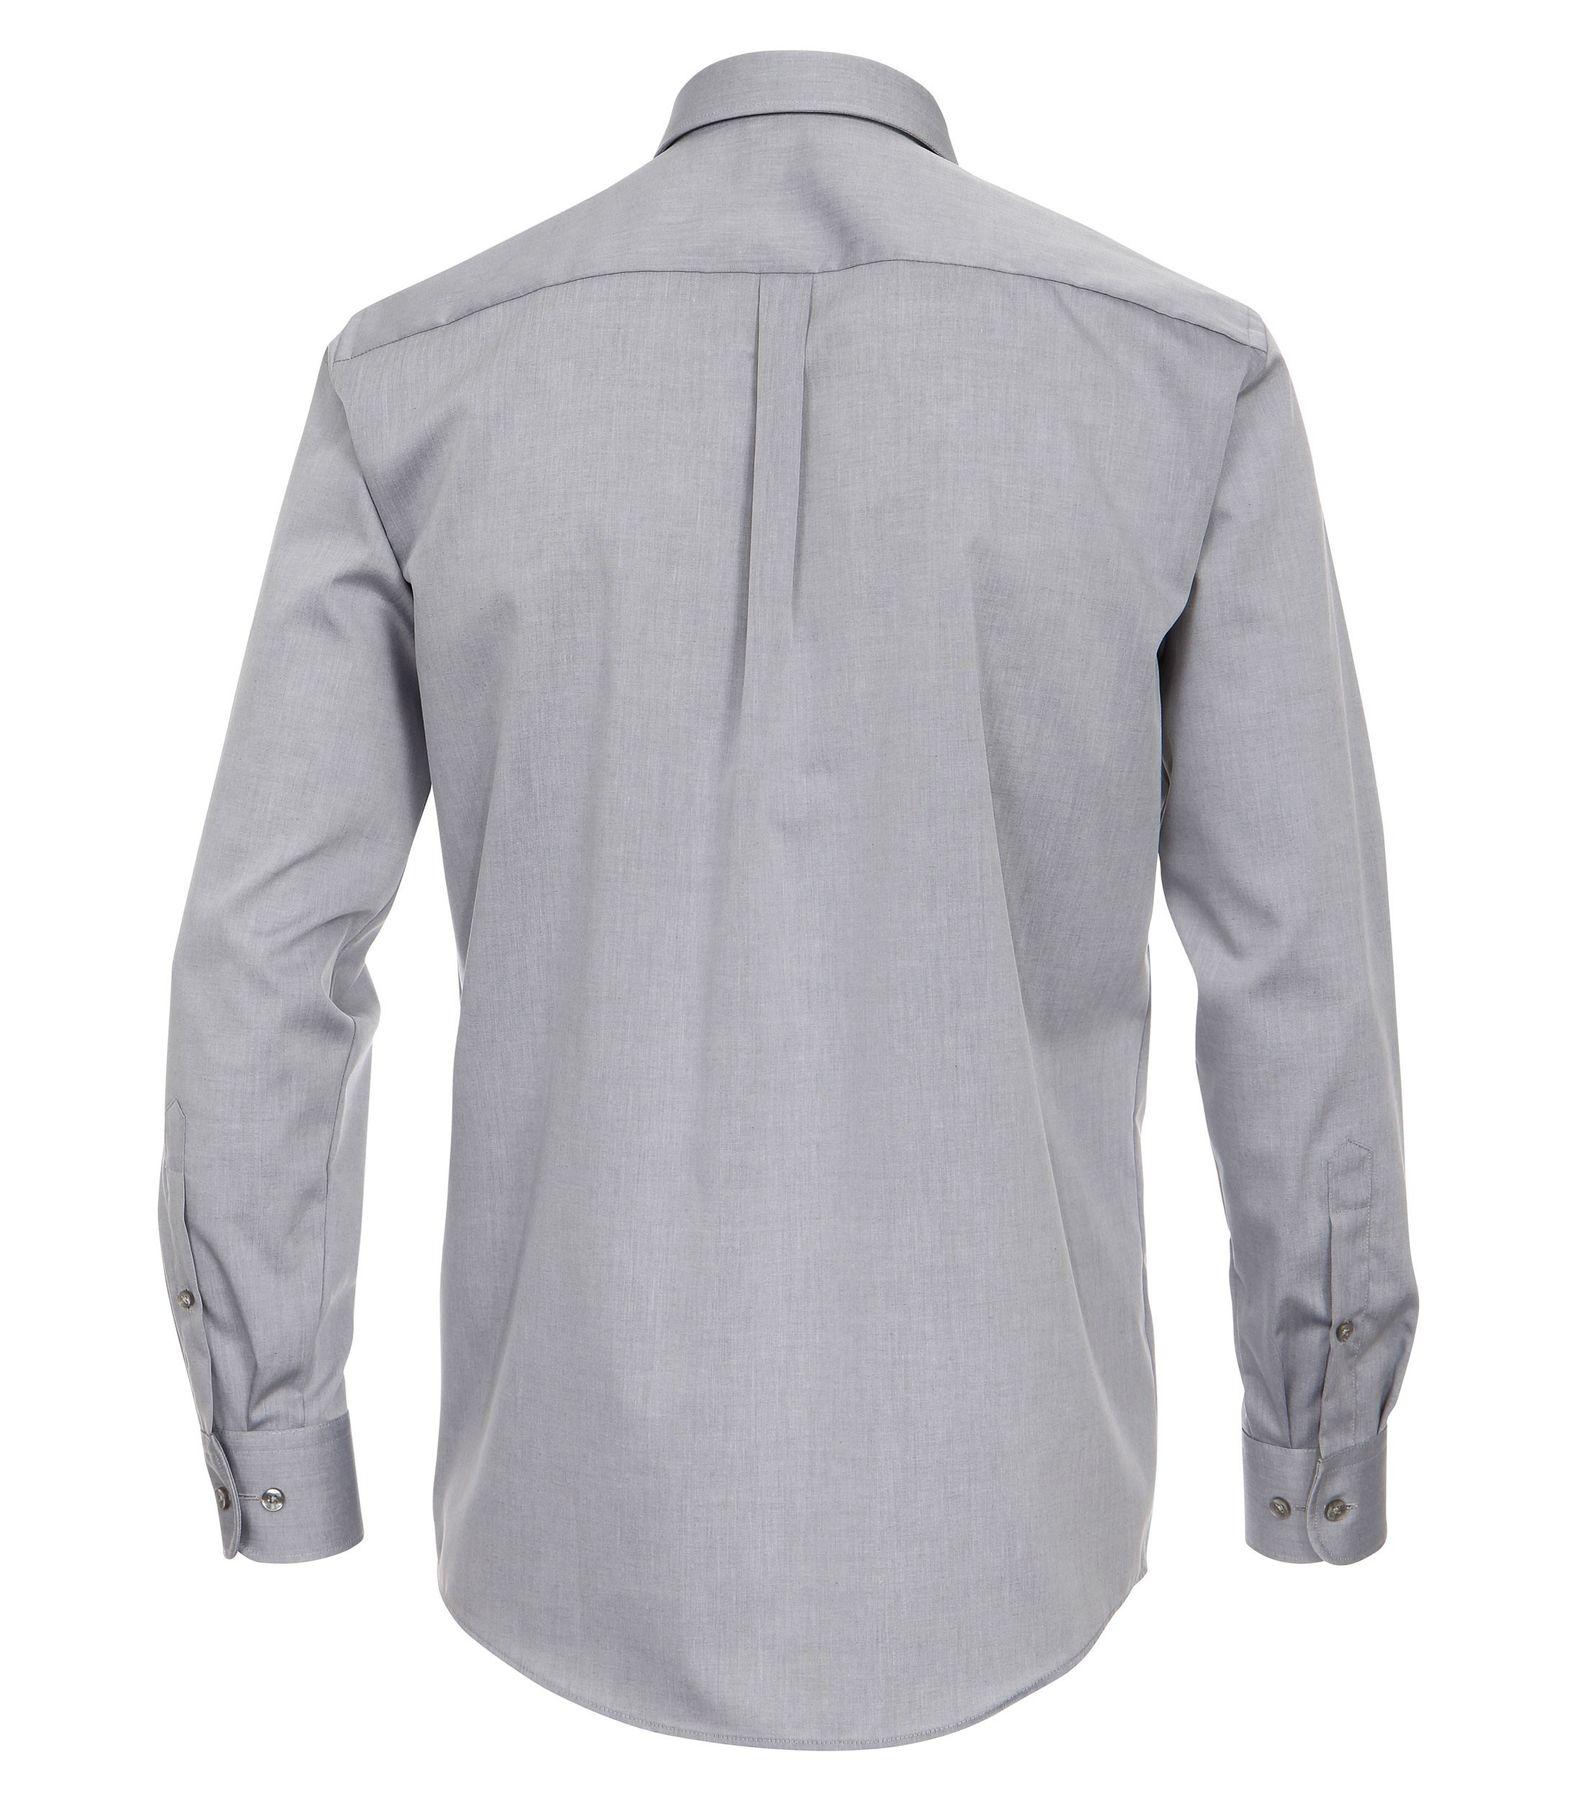 Casa Moda - Comfort Fit - Bügelfreies Herren Business Langarm Hemd verschiedene Farben (006060A) – Bild 2